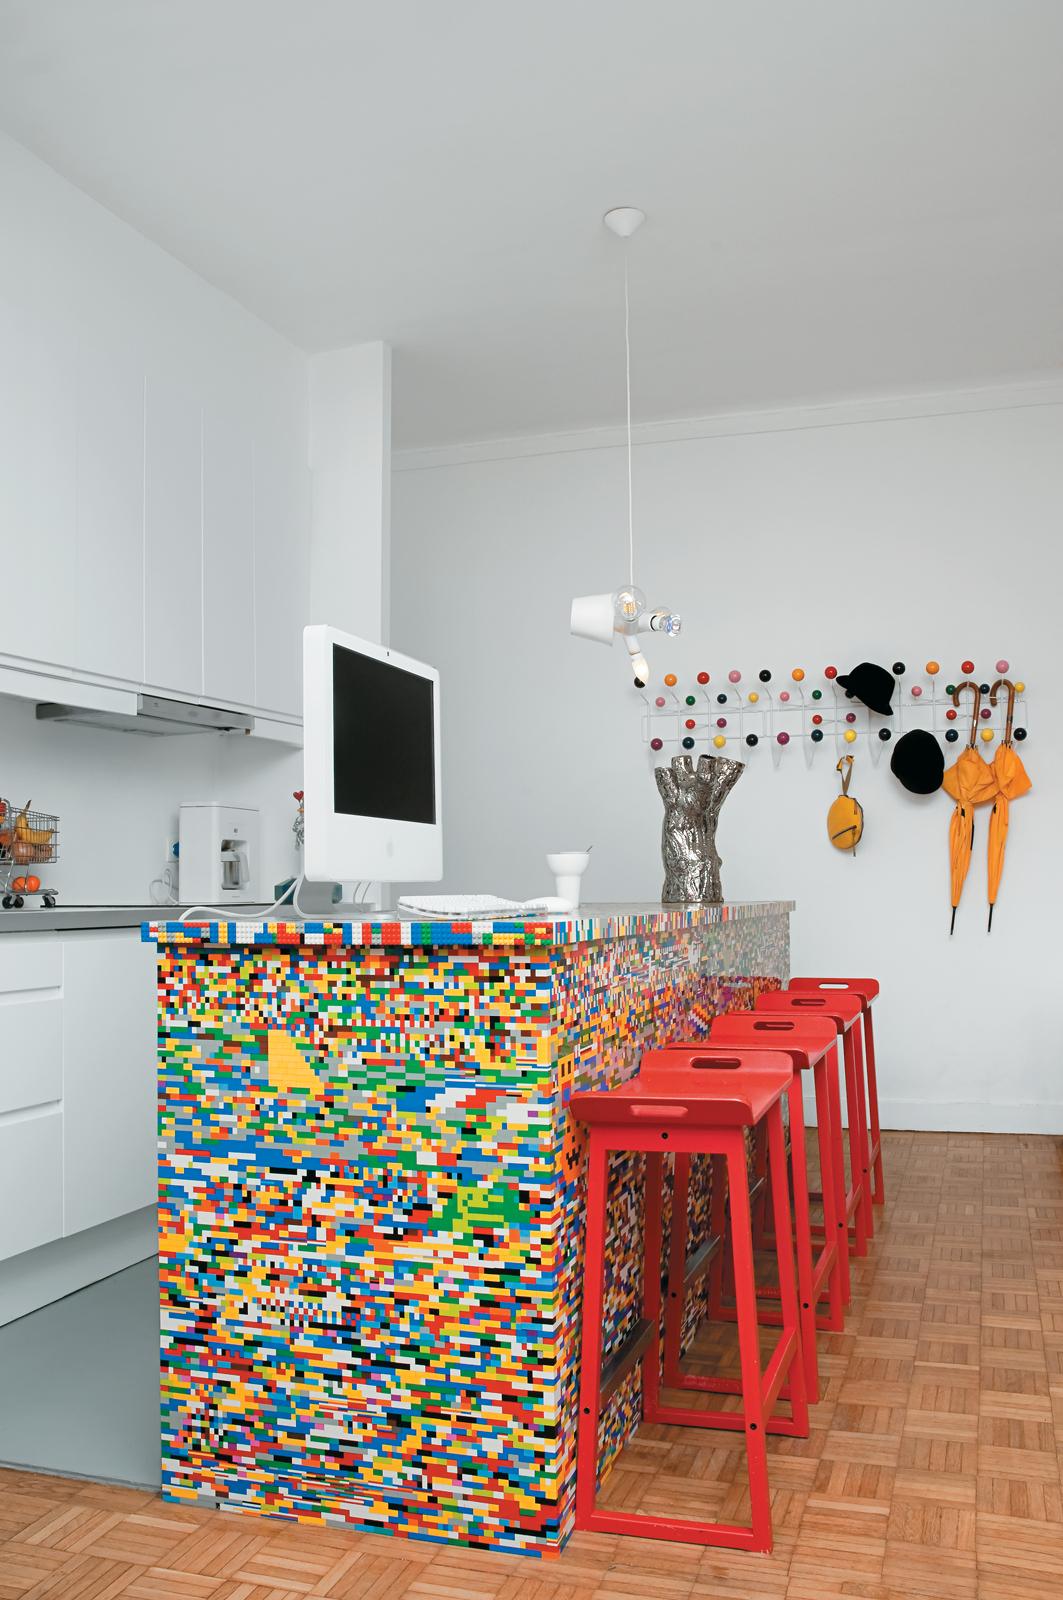 Simon Pillard And Philippe Rossetti S Lego Kitchen Island